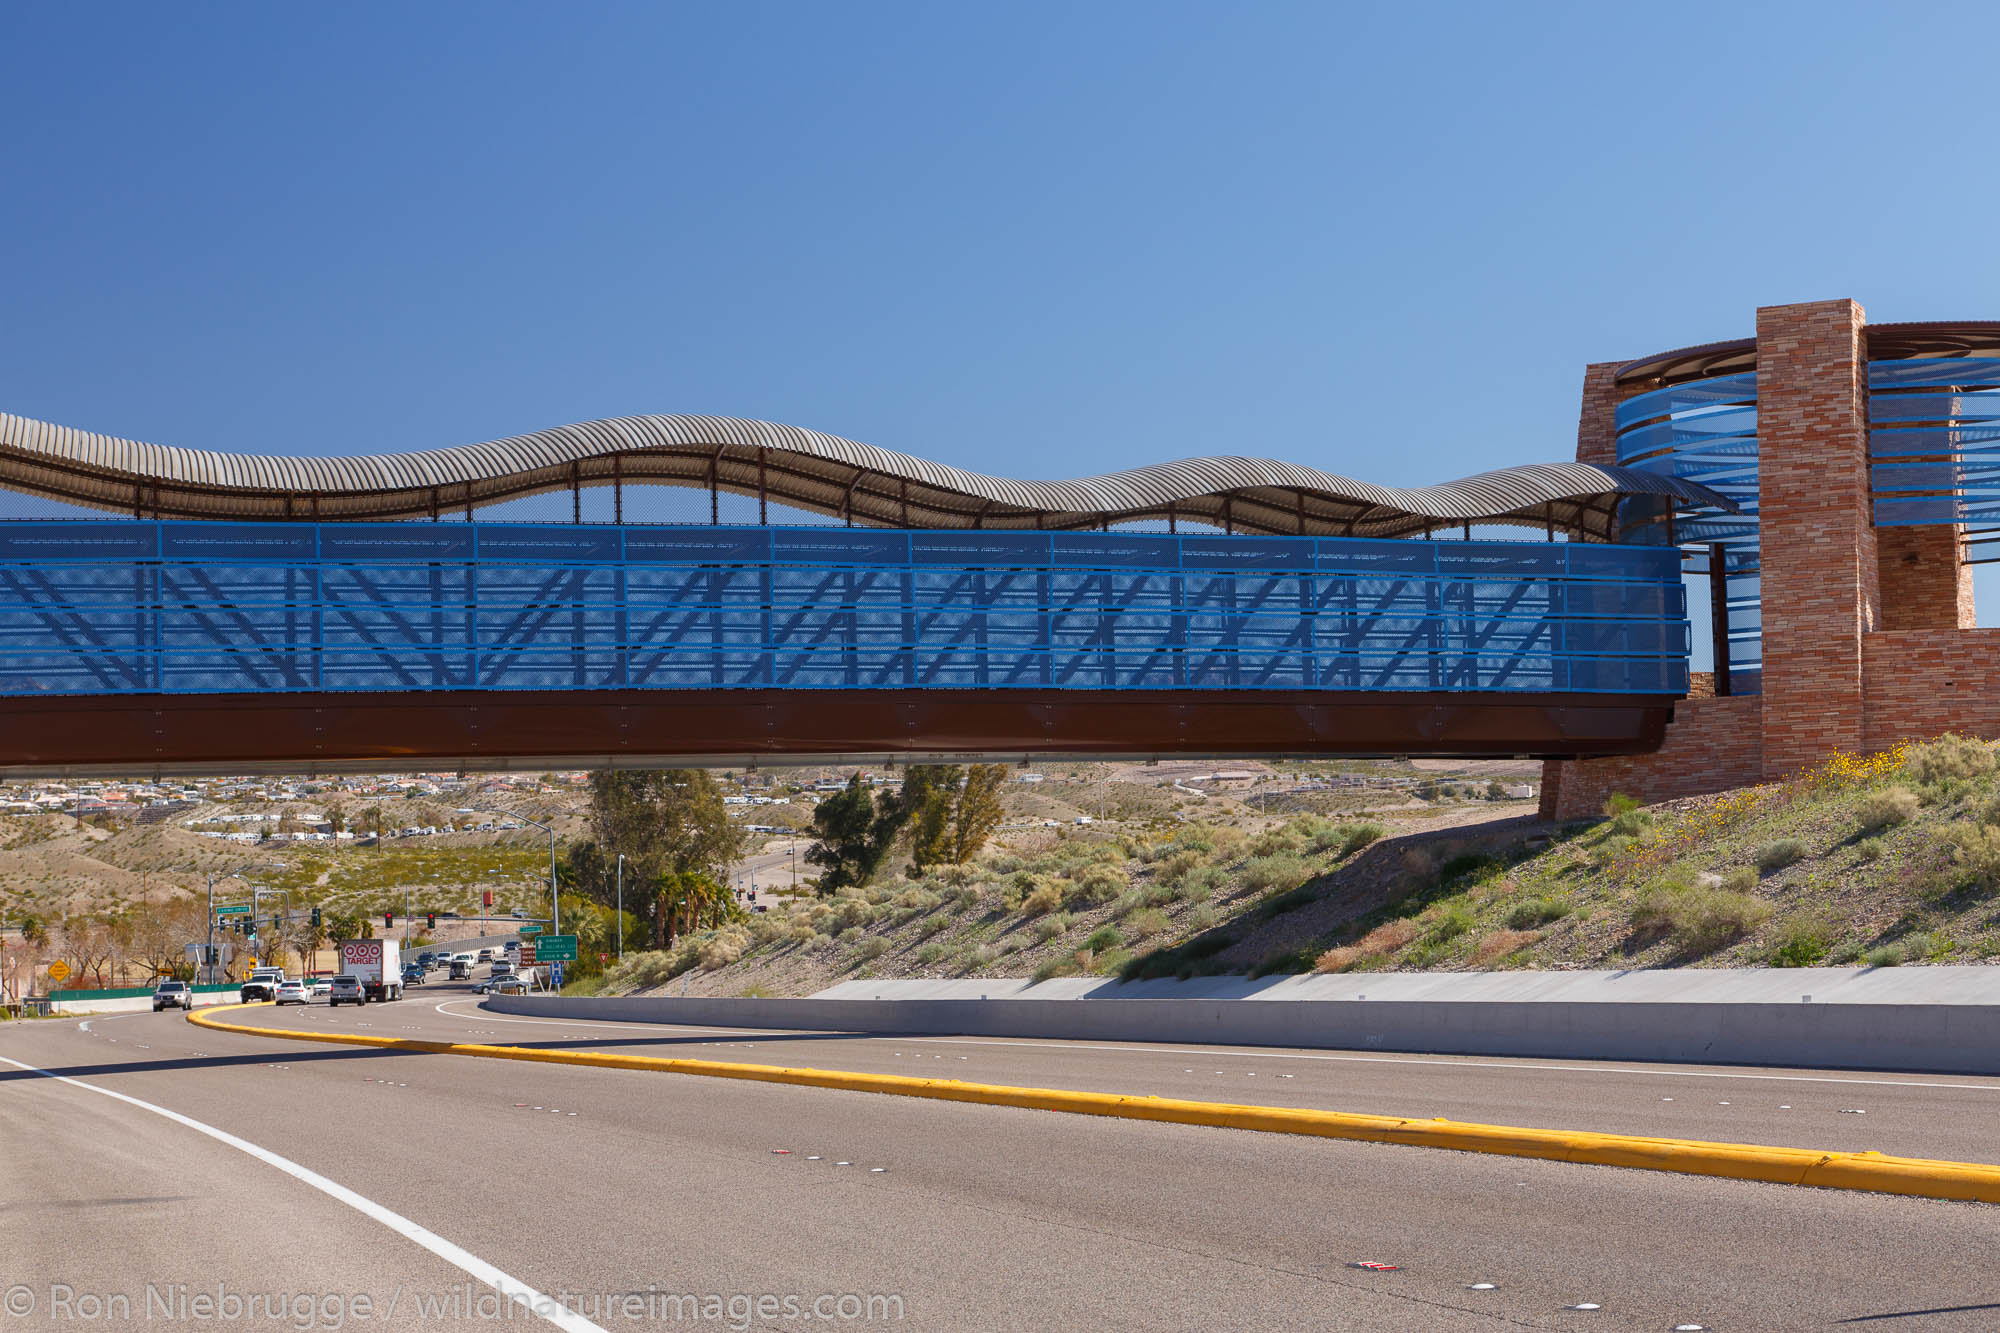 The Riverwalk Exploration Trail along the Colorado River, Laughlin, Nevada.